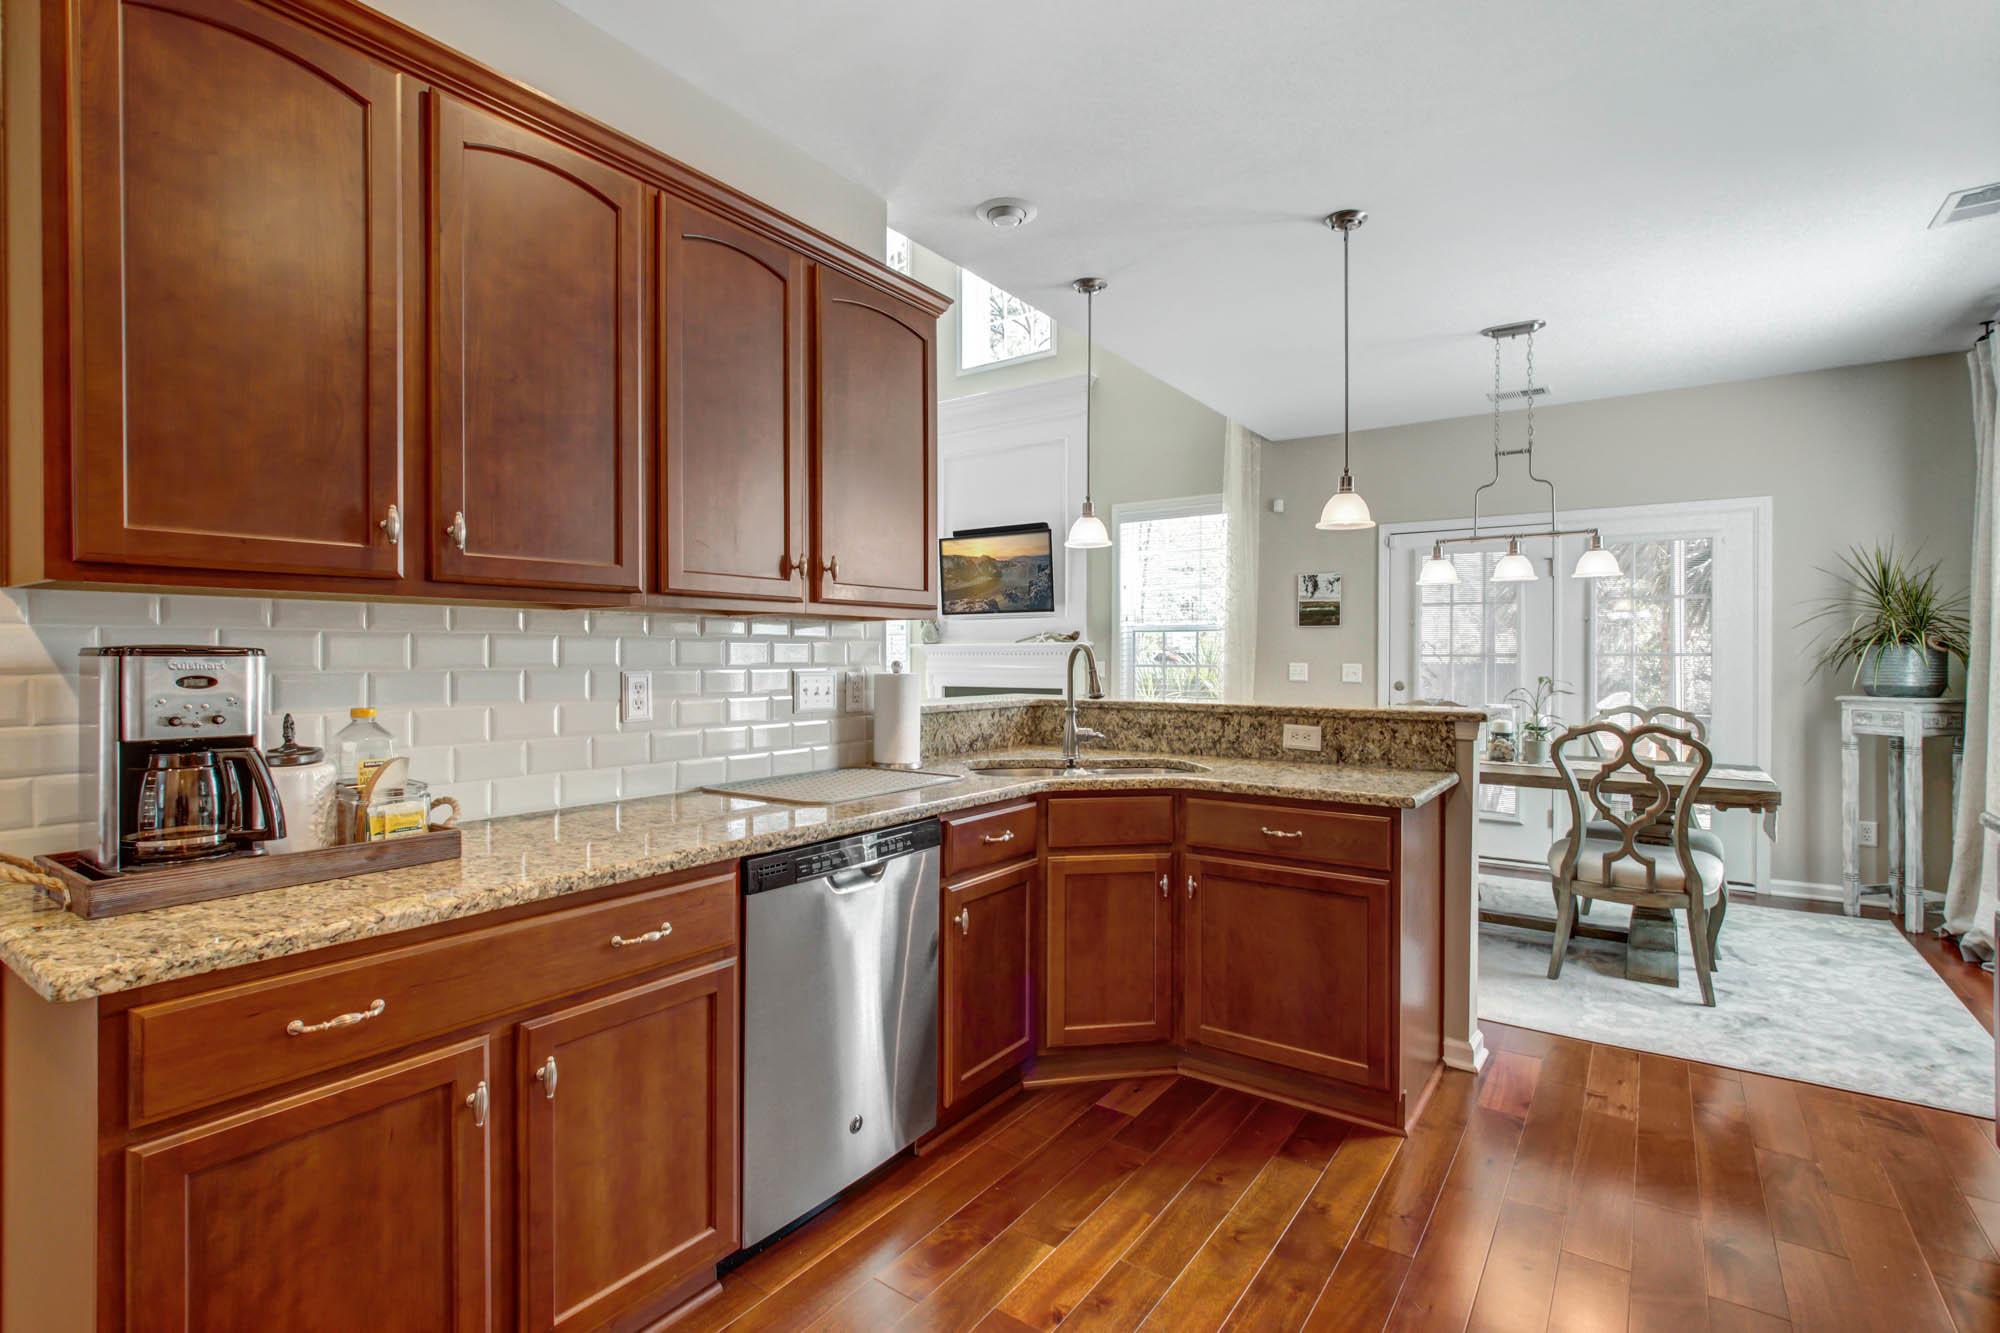 Sweetgrass Village Homes For Sale - 2287 Show Basket, Mount Pleasant, SC - 3